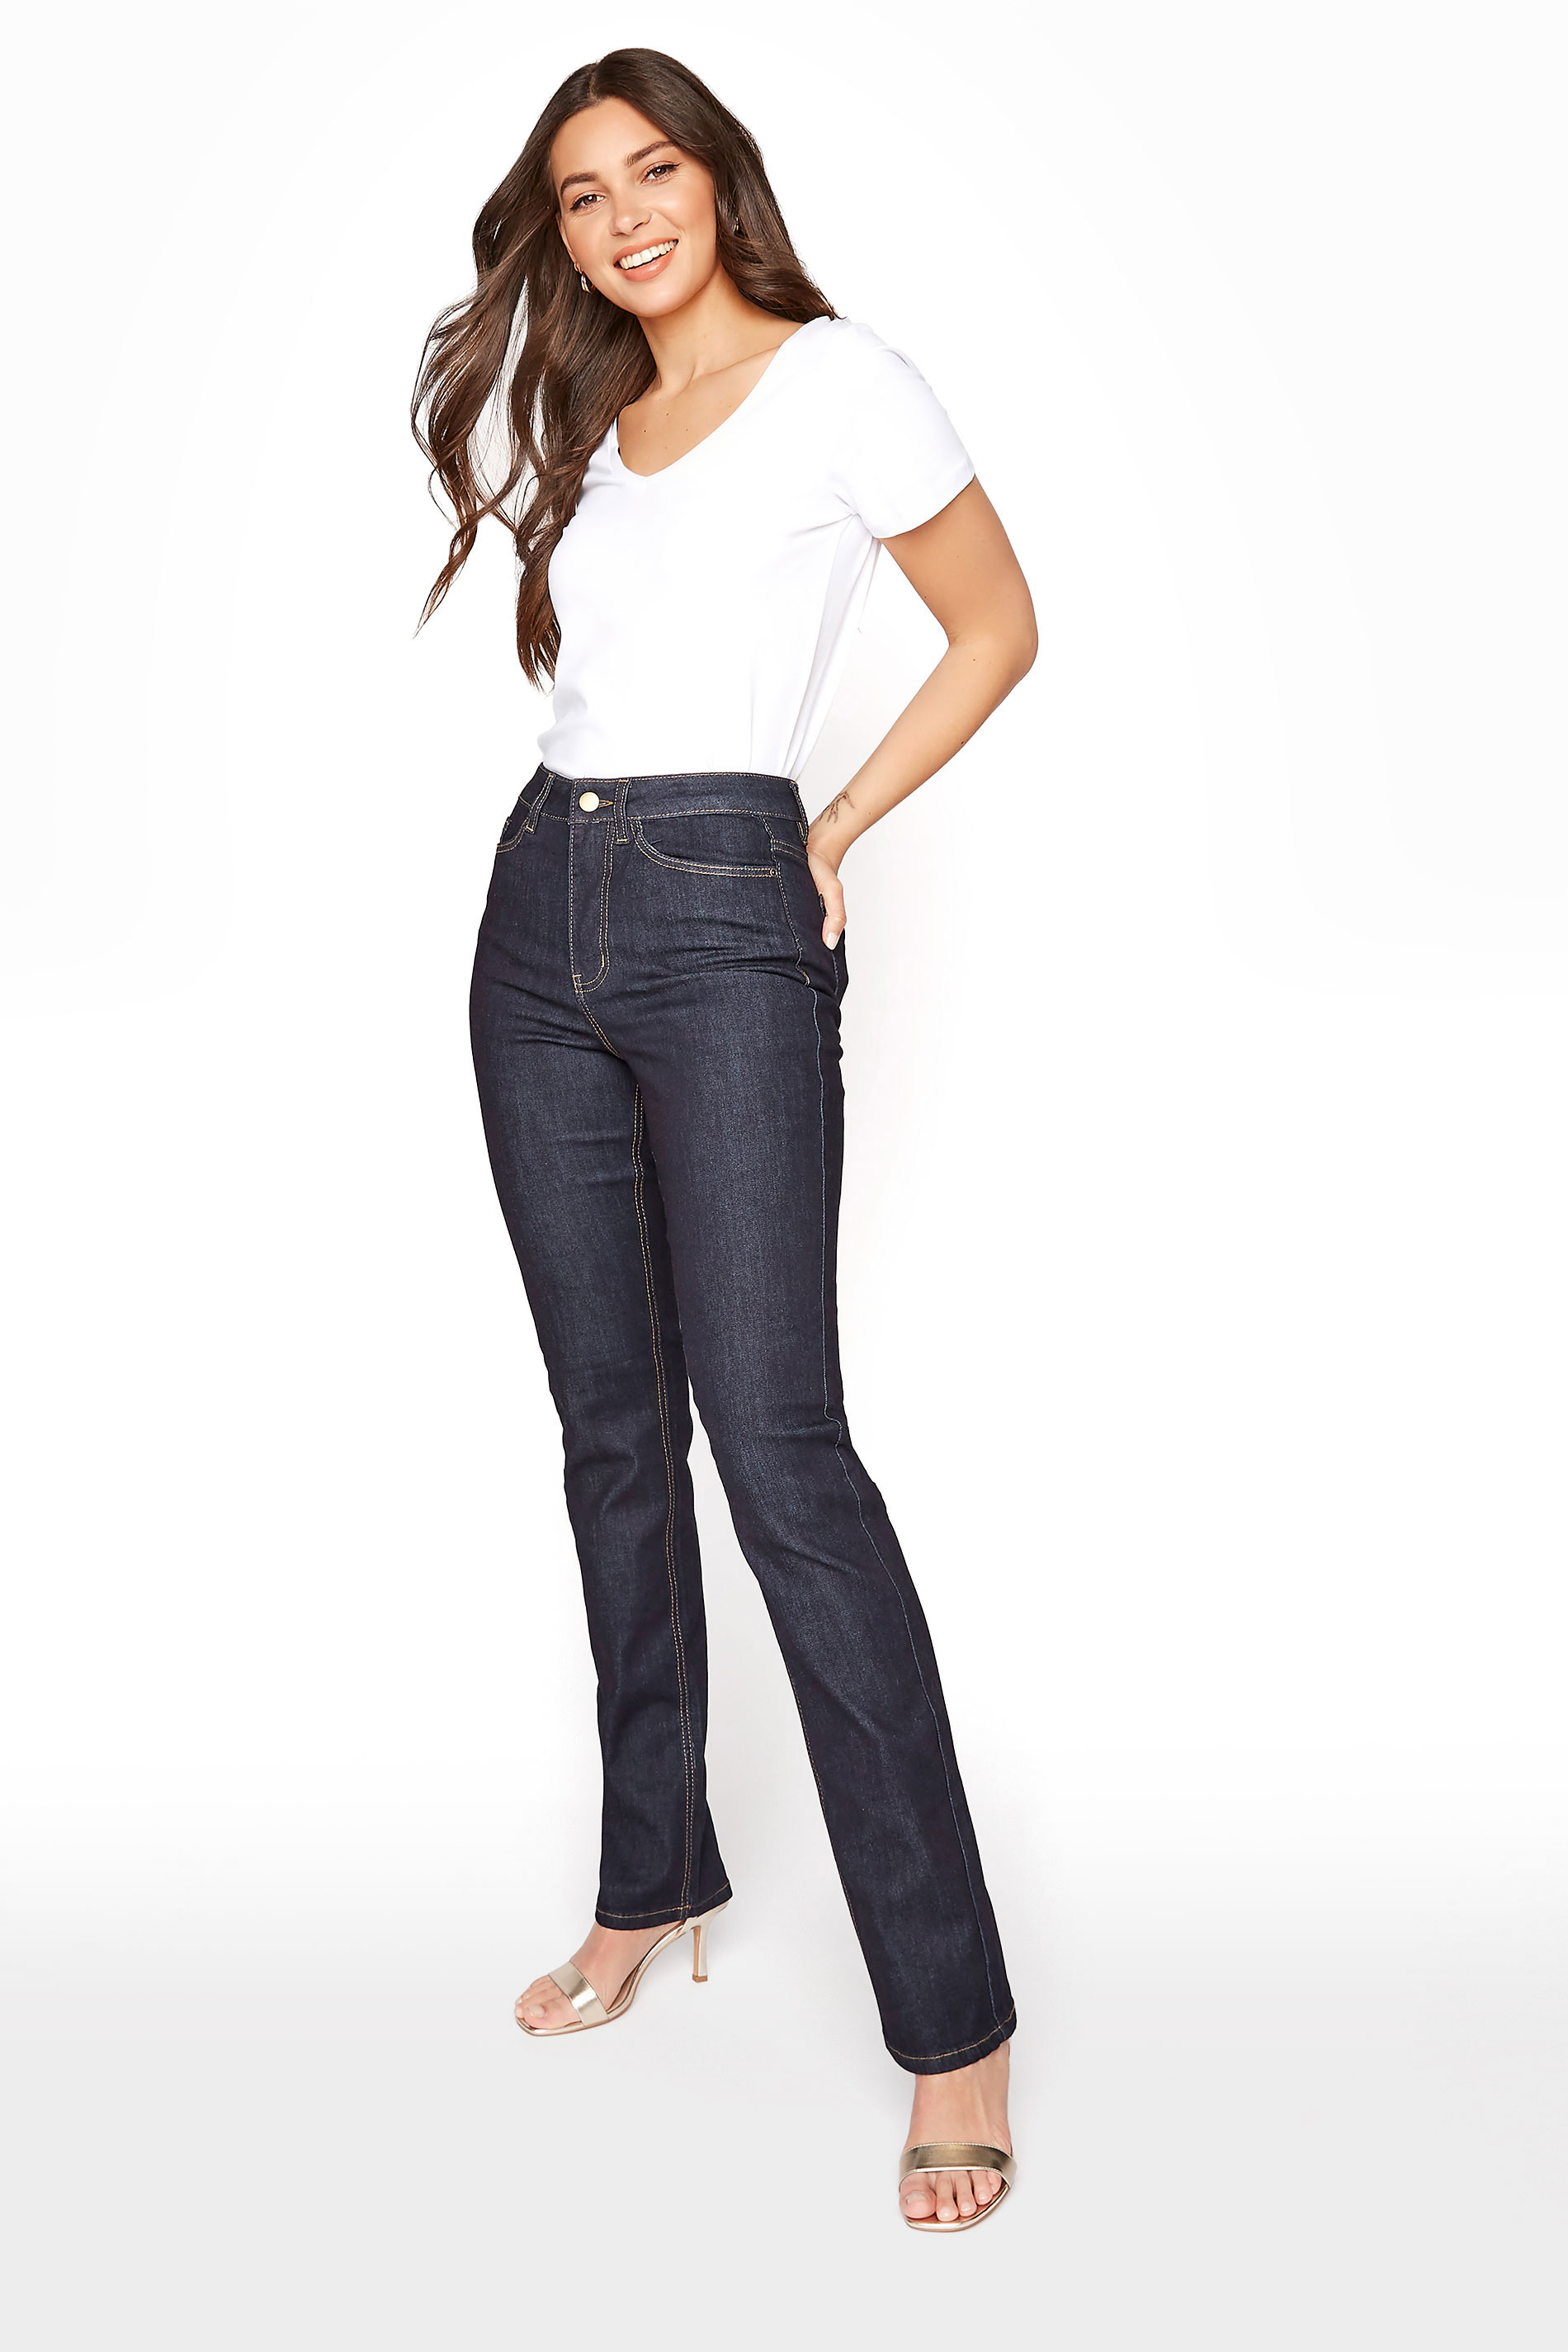 Indigo Blue Straight Leg Denim Jeans